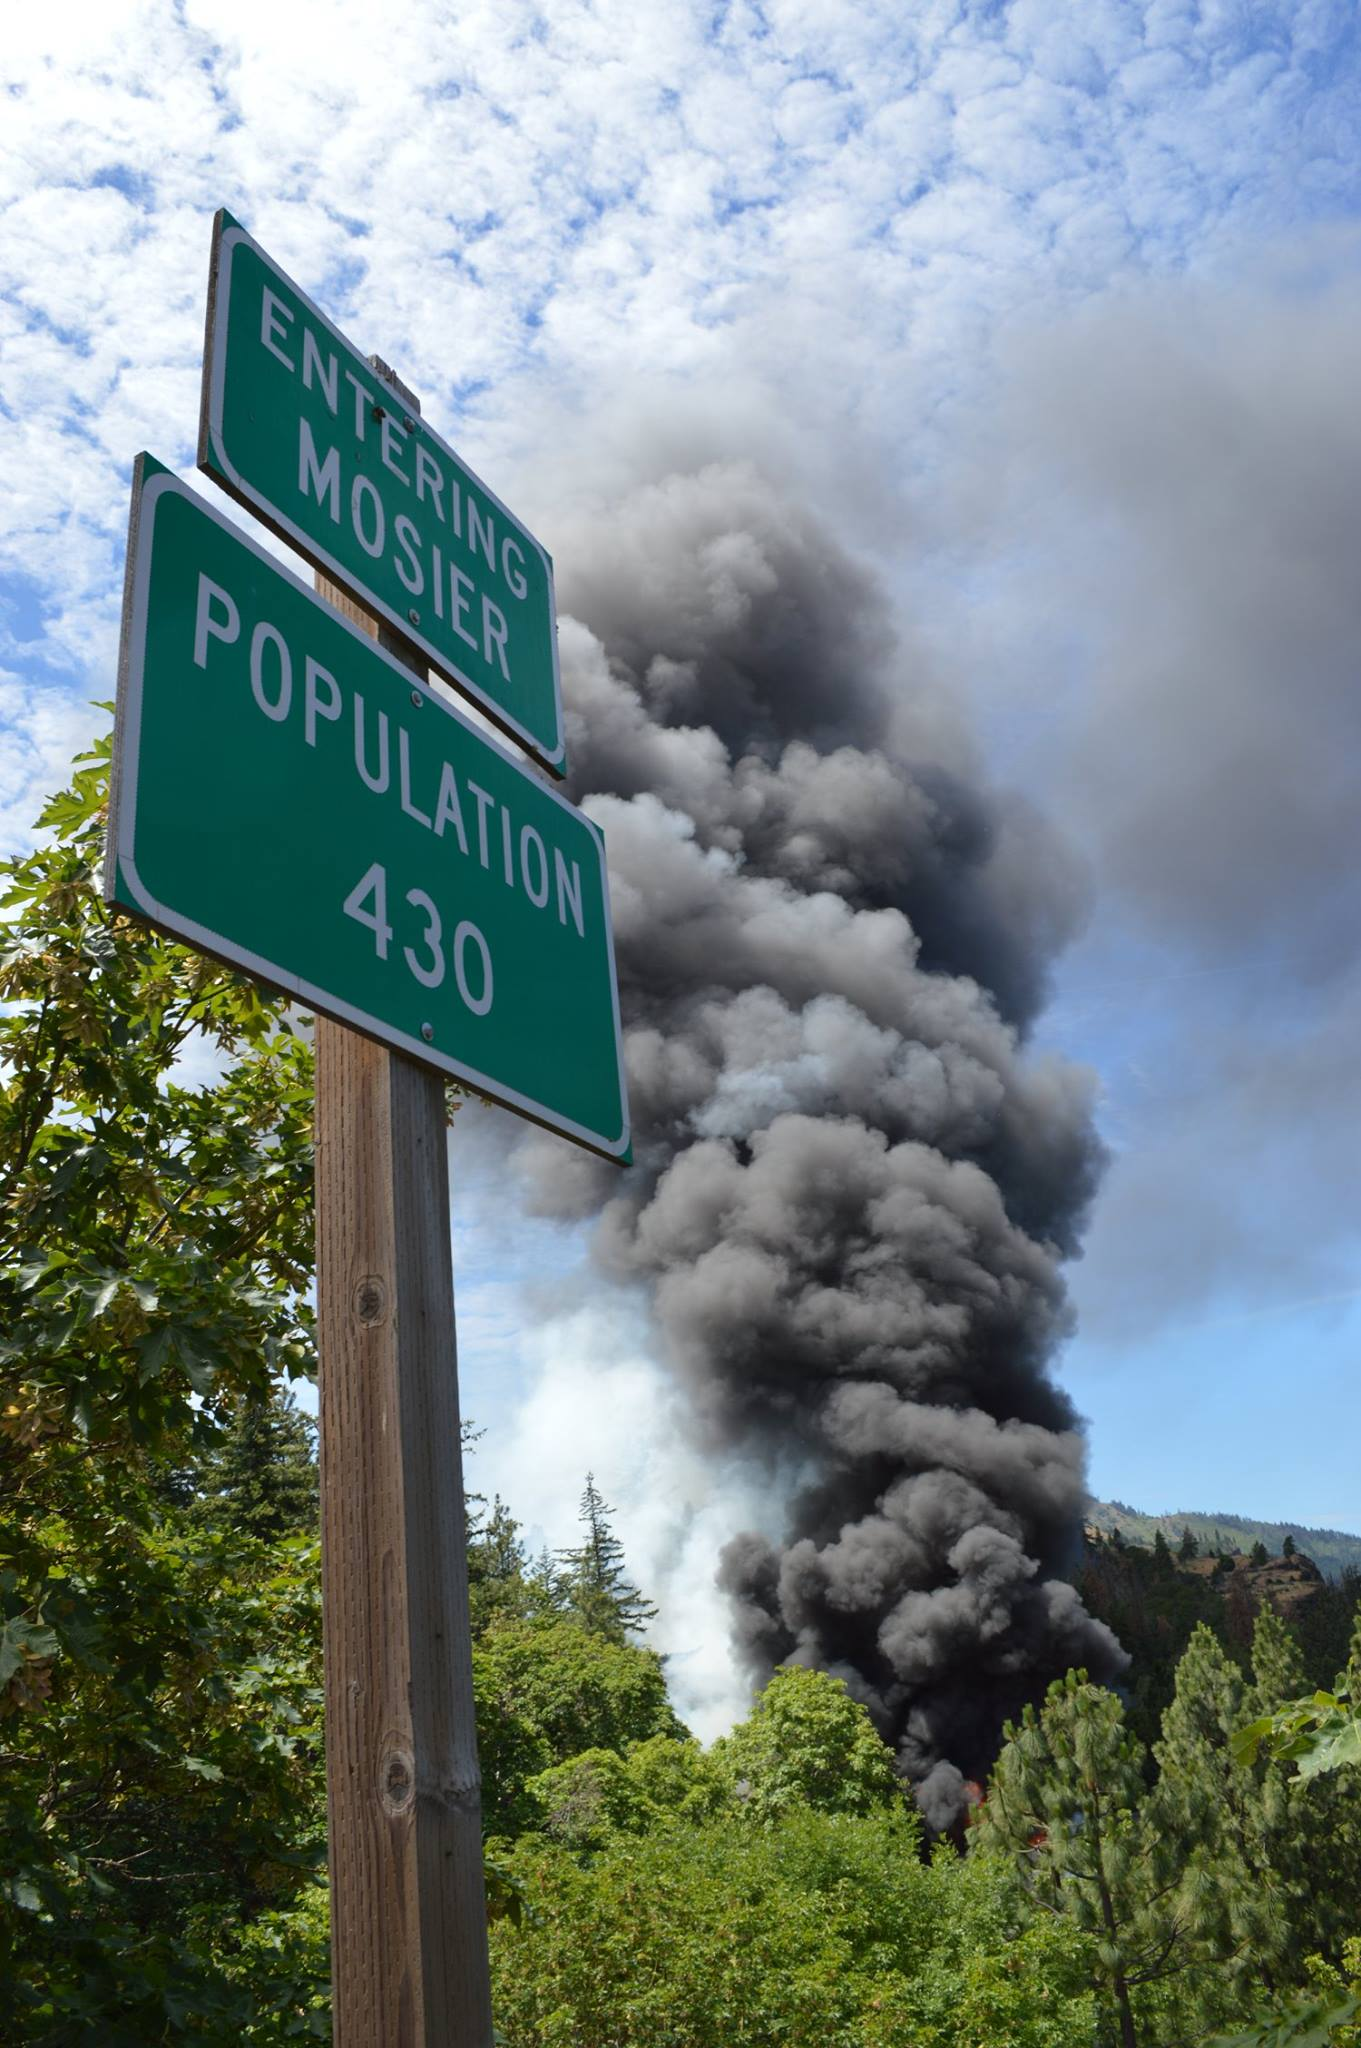 June 3, 2016 in Mosier, Oregon - oil train derailment disaster.  Photo: Hood River News / Patrick Mulville